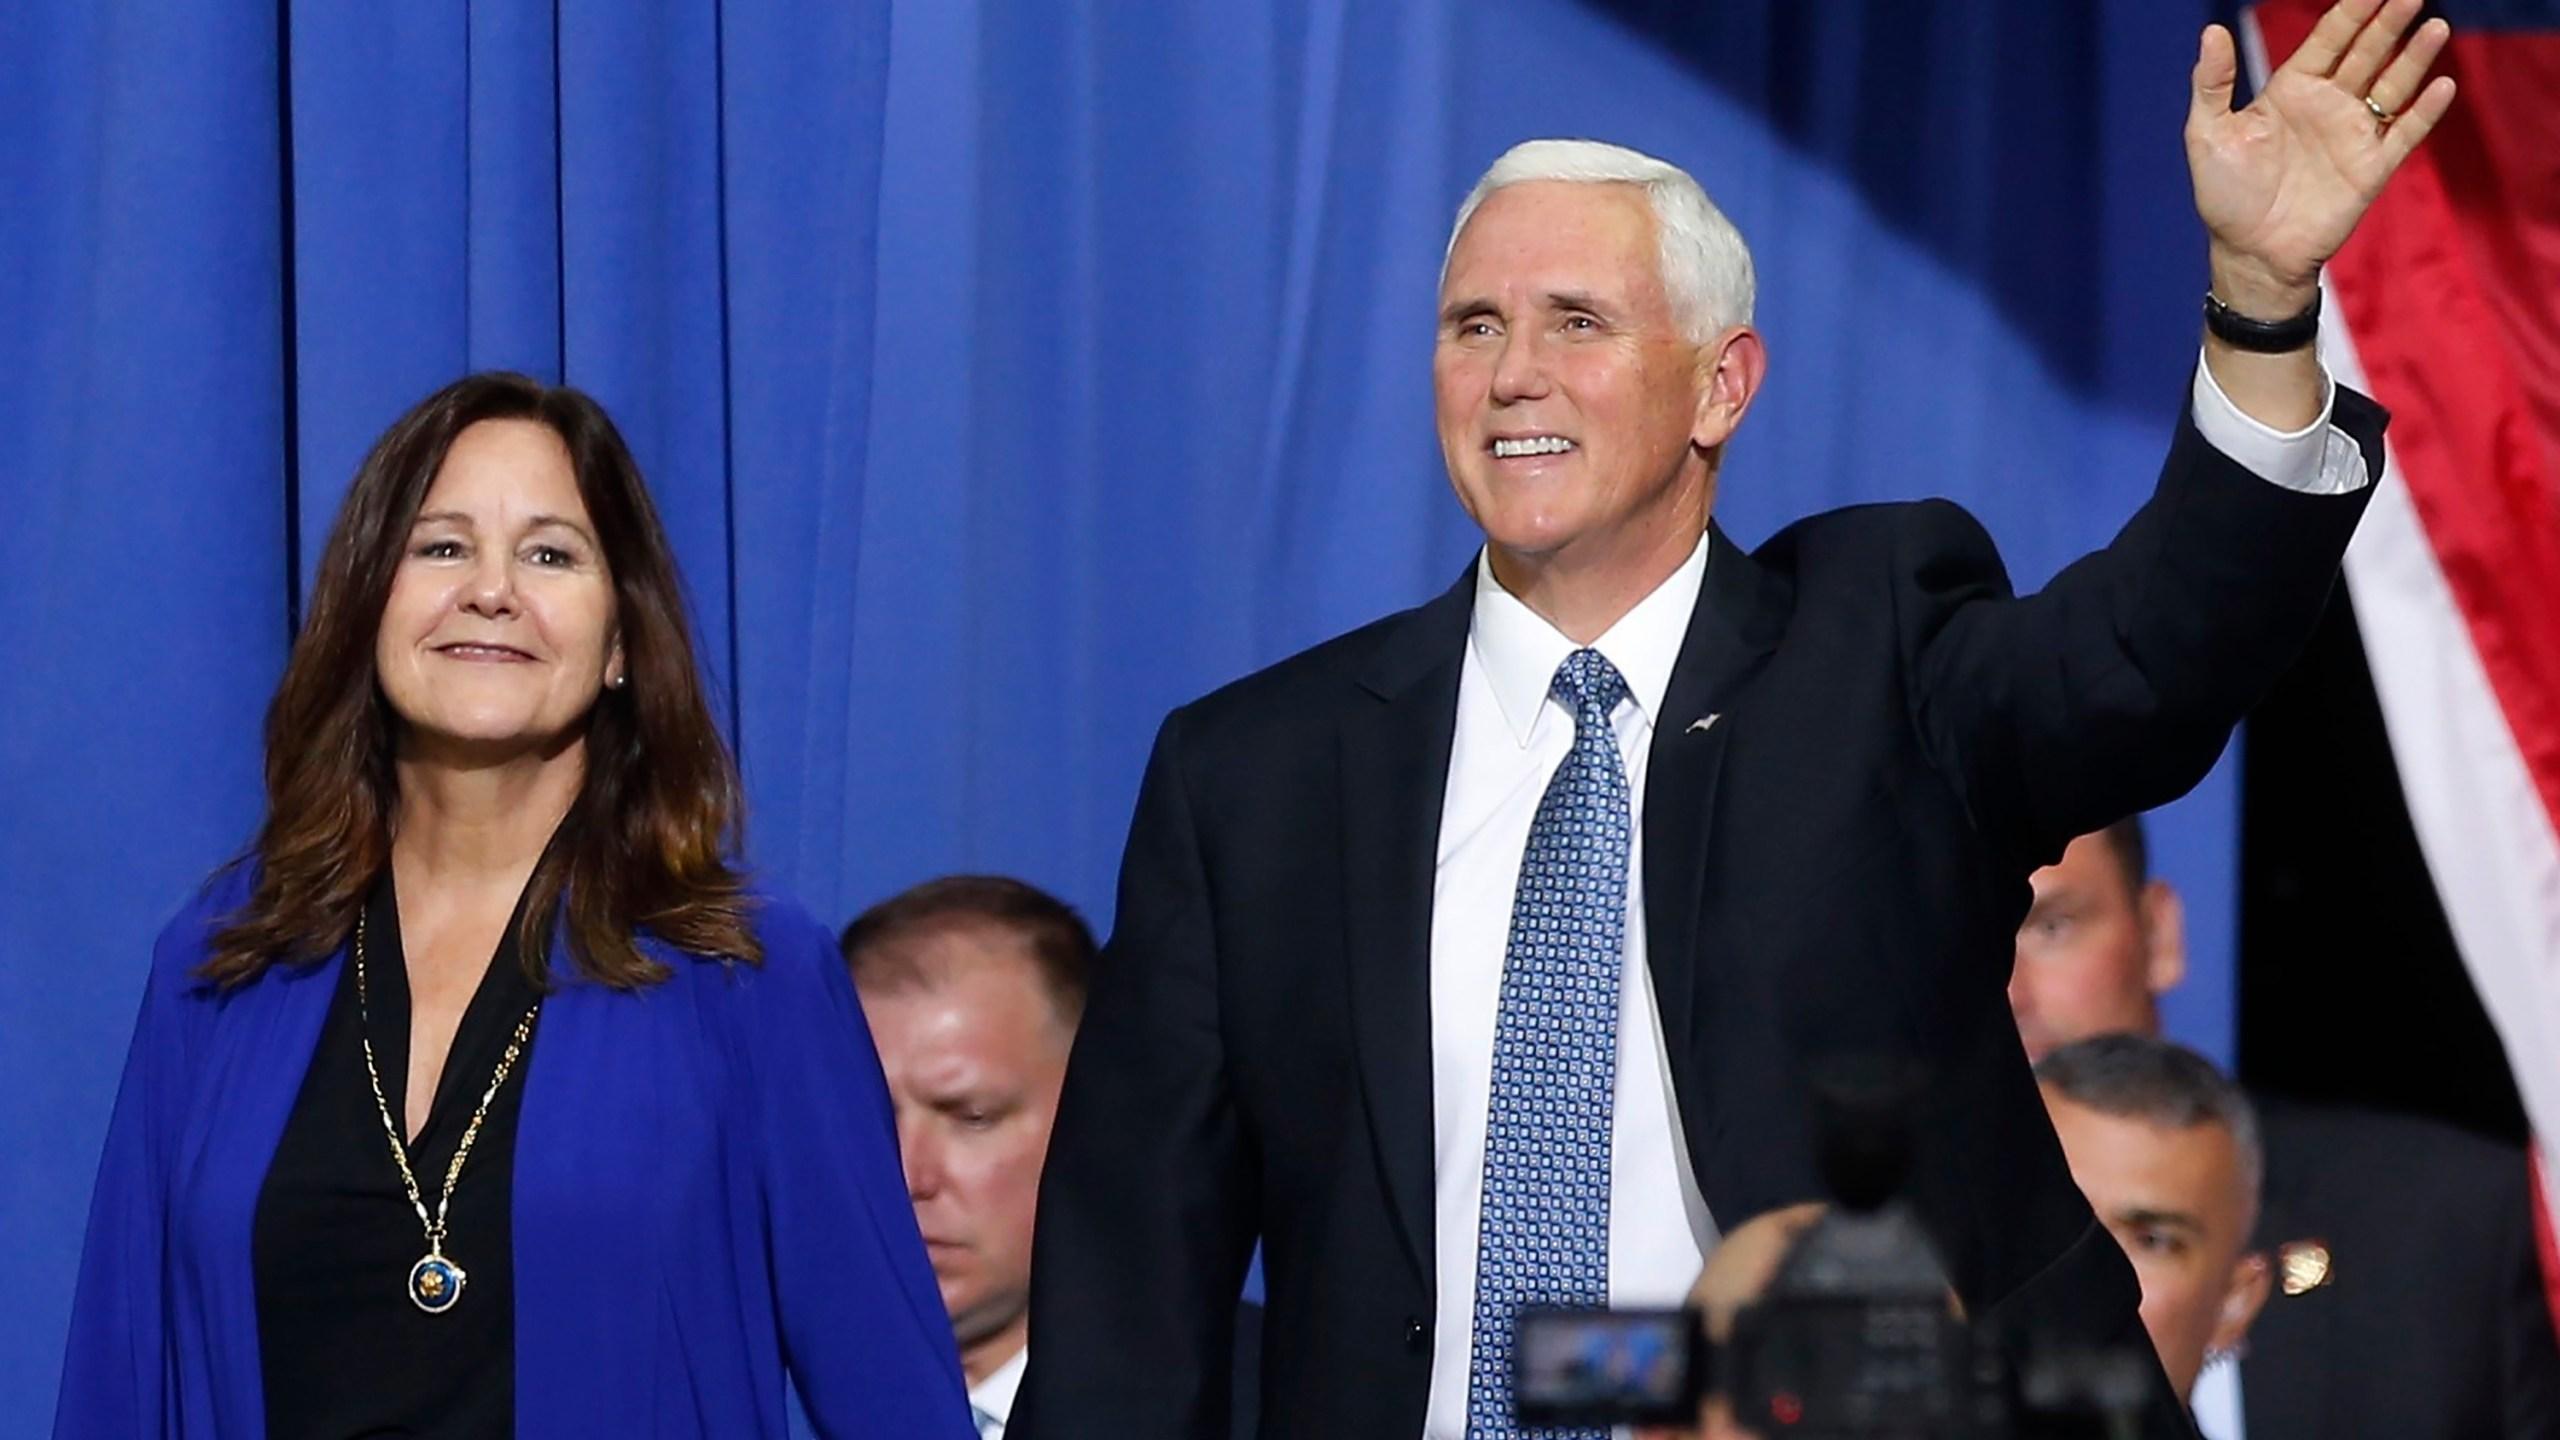 Mike Pence, Karen Pence